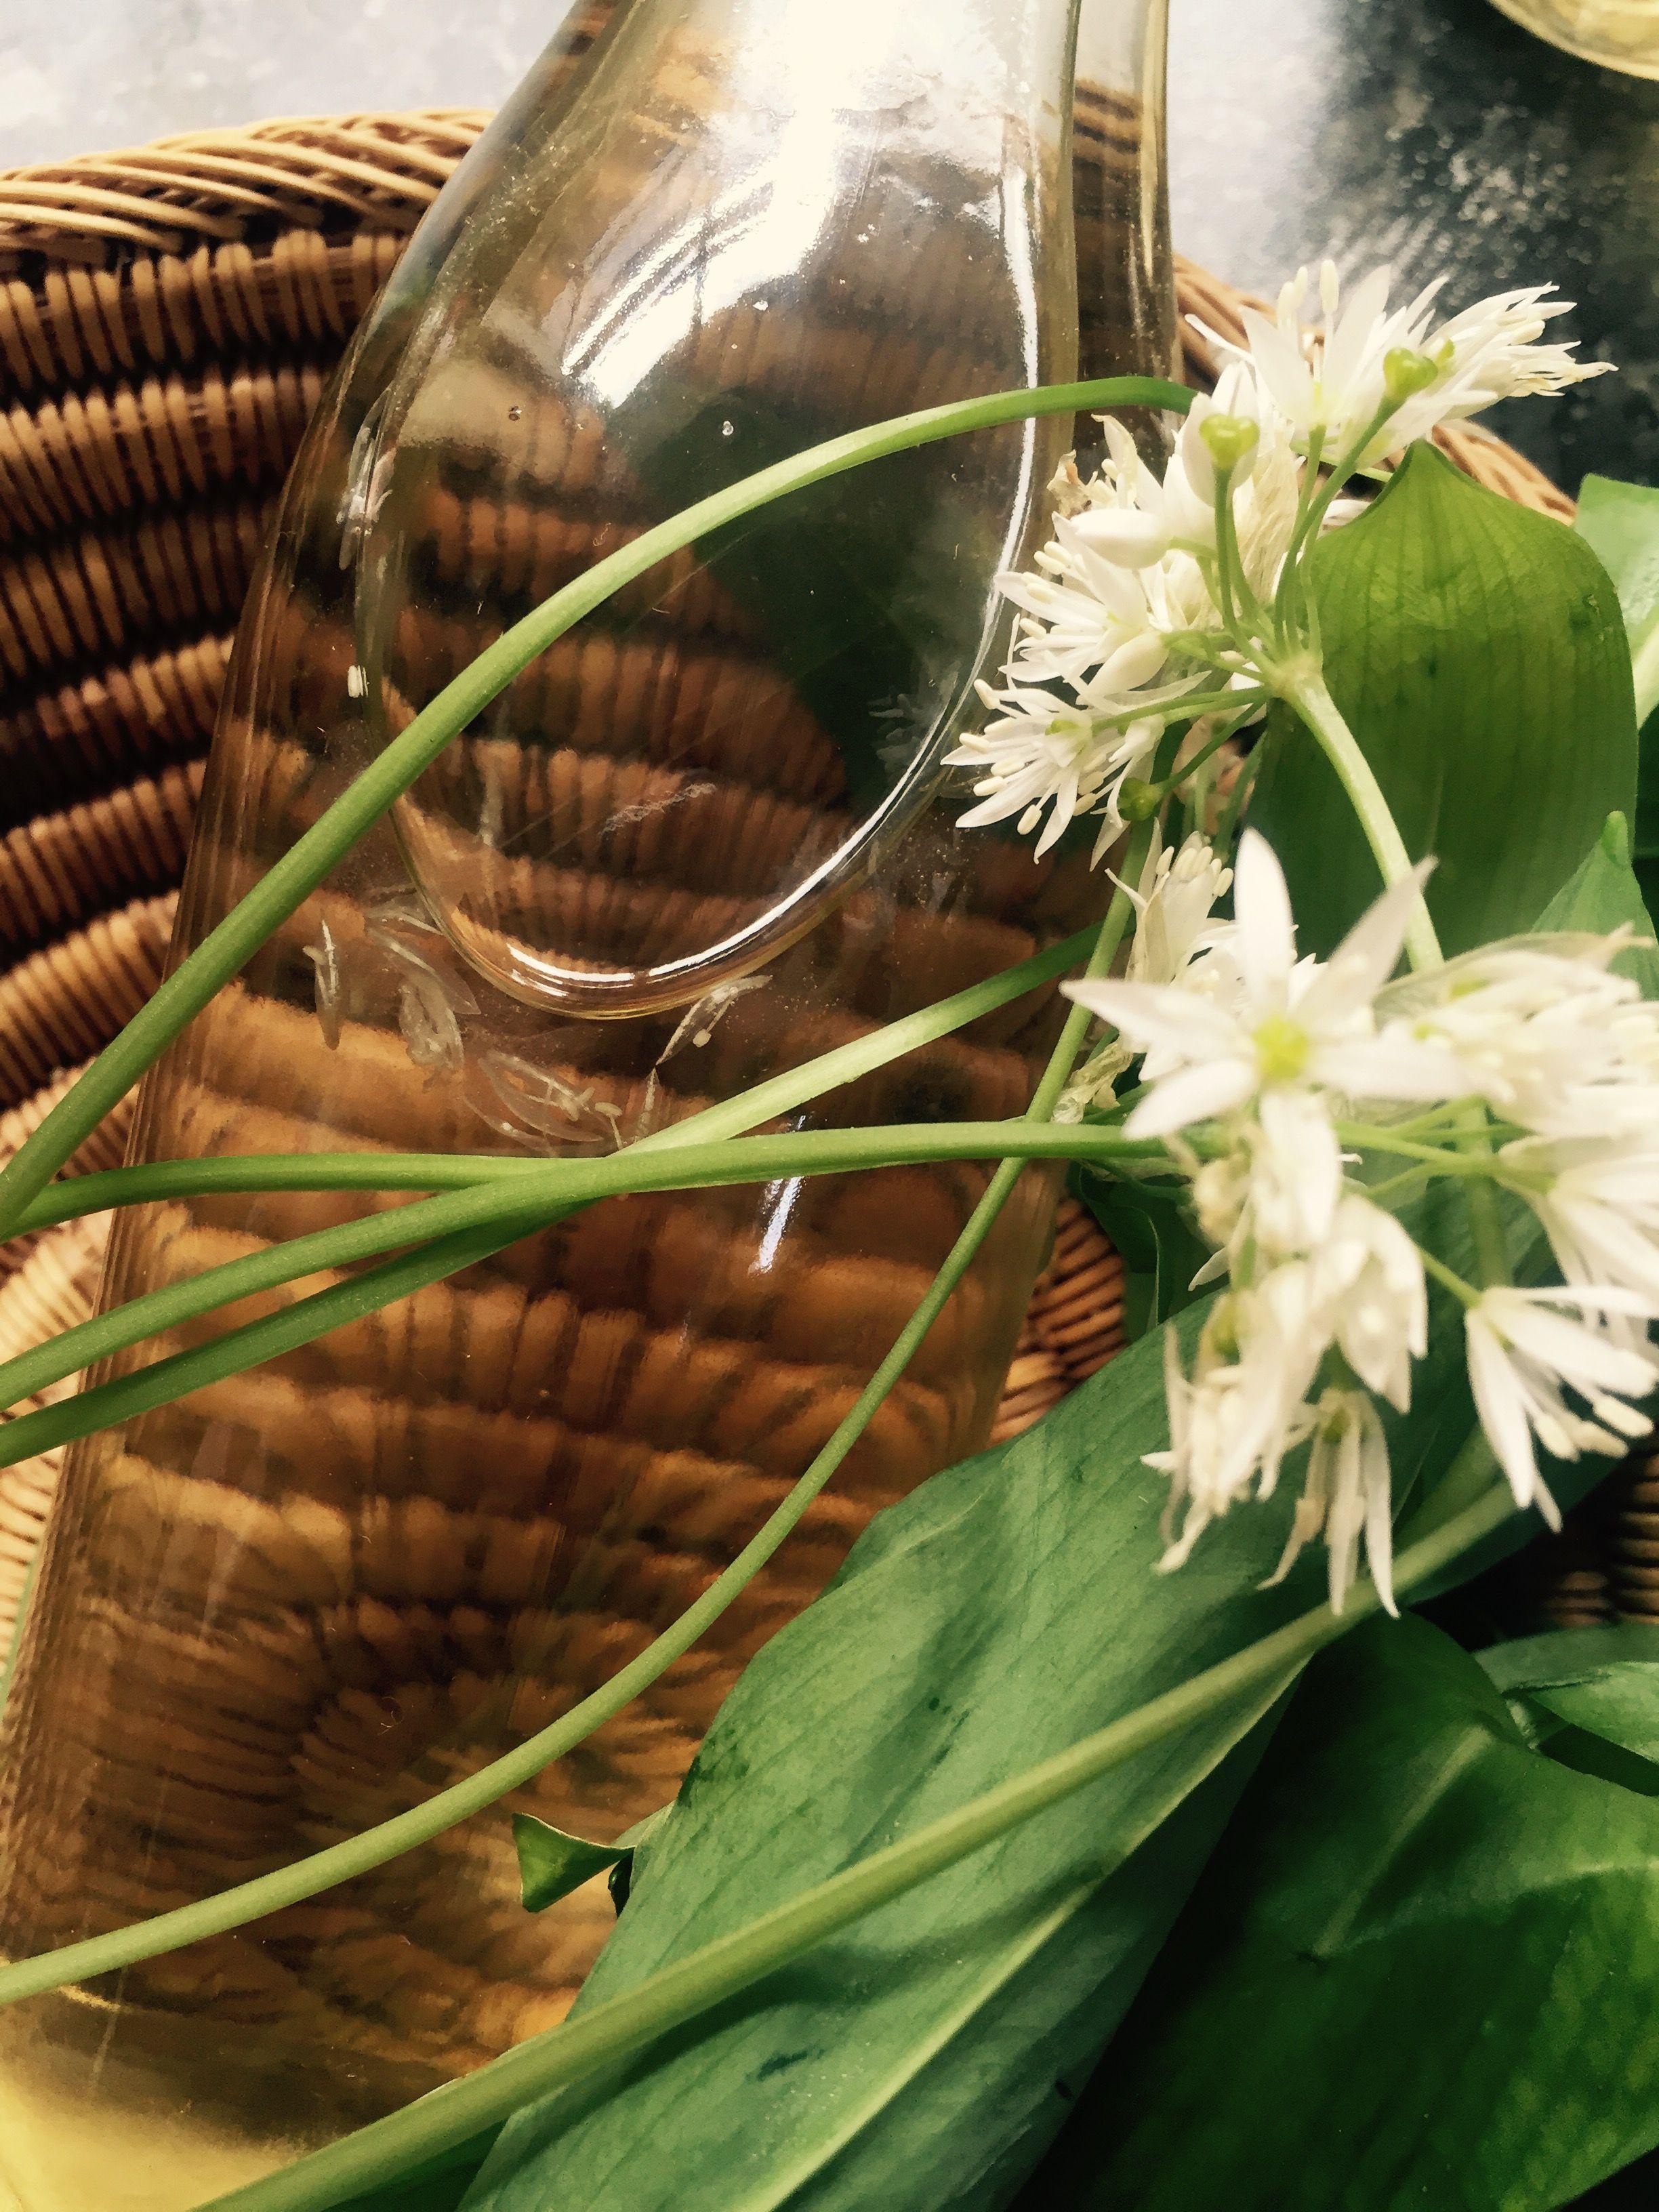 Wild garlic (ramsons) vinegar à la Frances Bissell